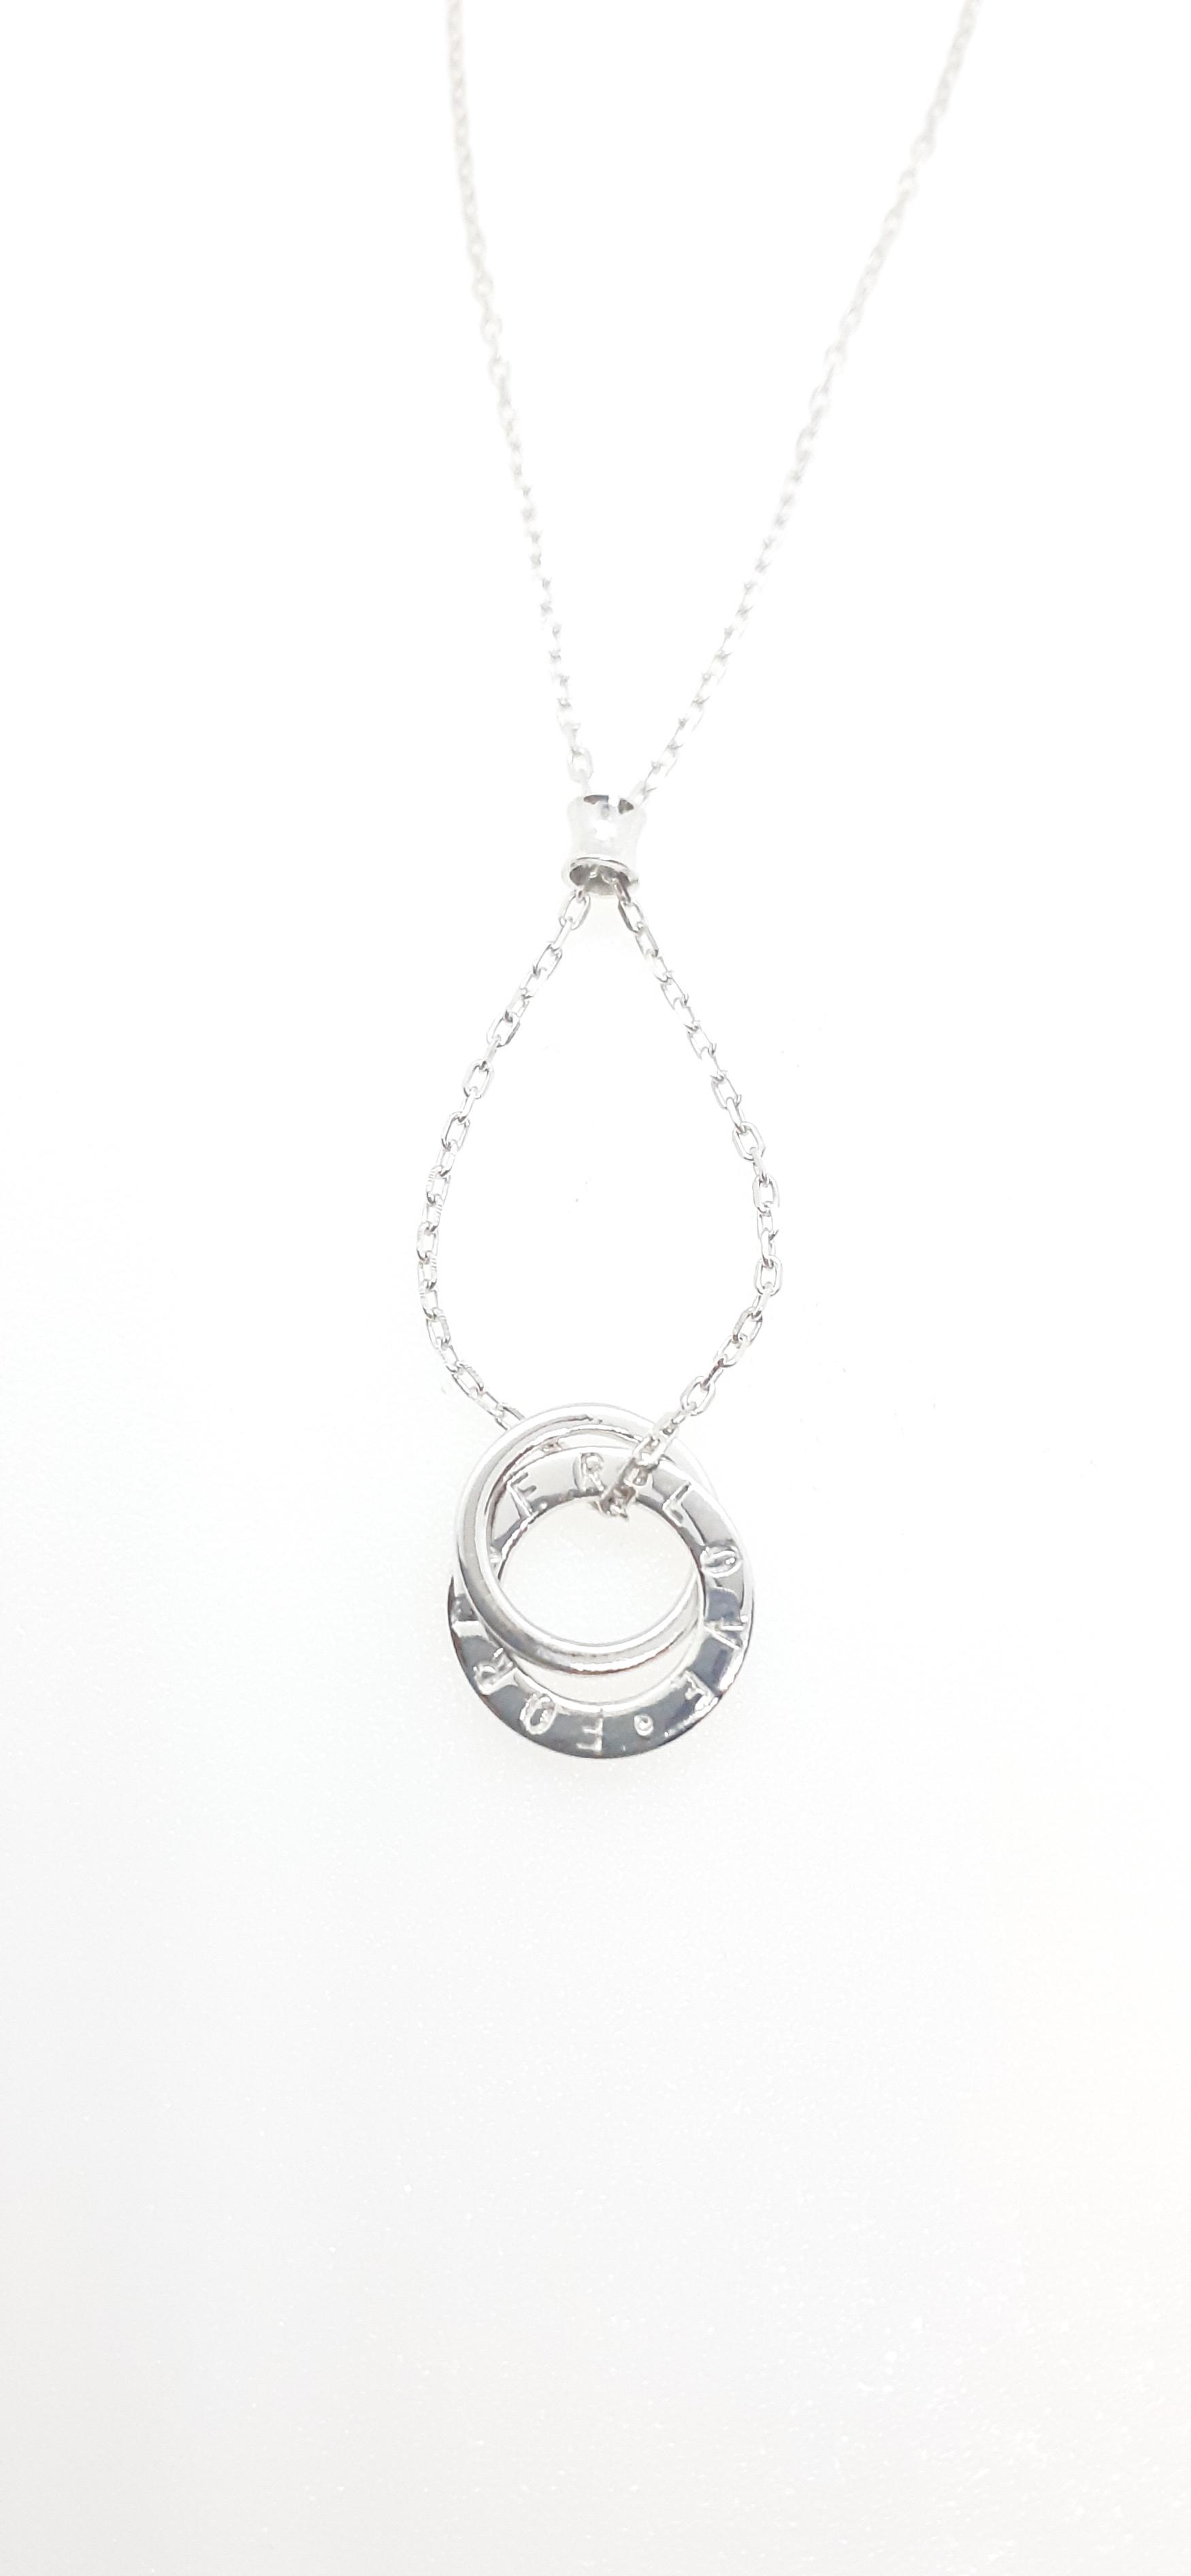 Sensi joyas jewellery Granada silver engagement925 ML SILVER NECKLACE